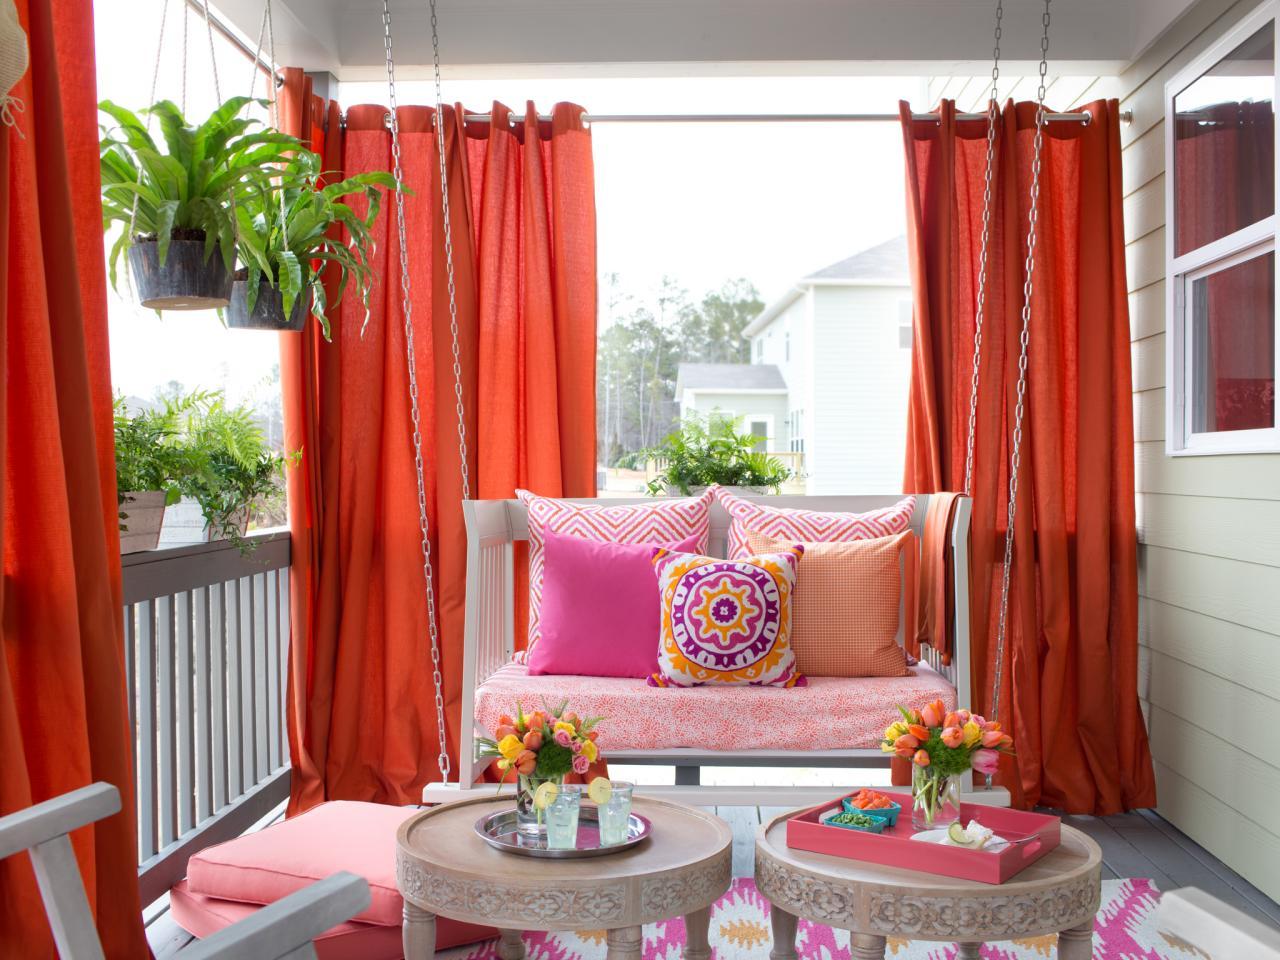 Inspiring Ideas for a small balcony | Interior Design Paradise